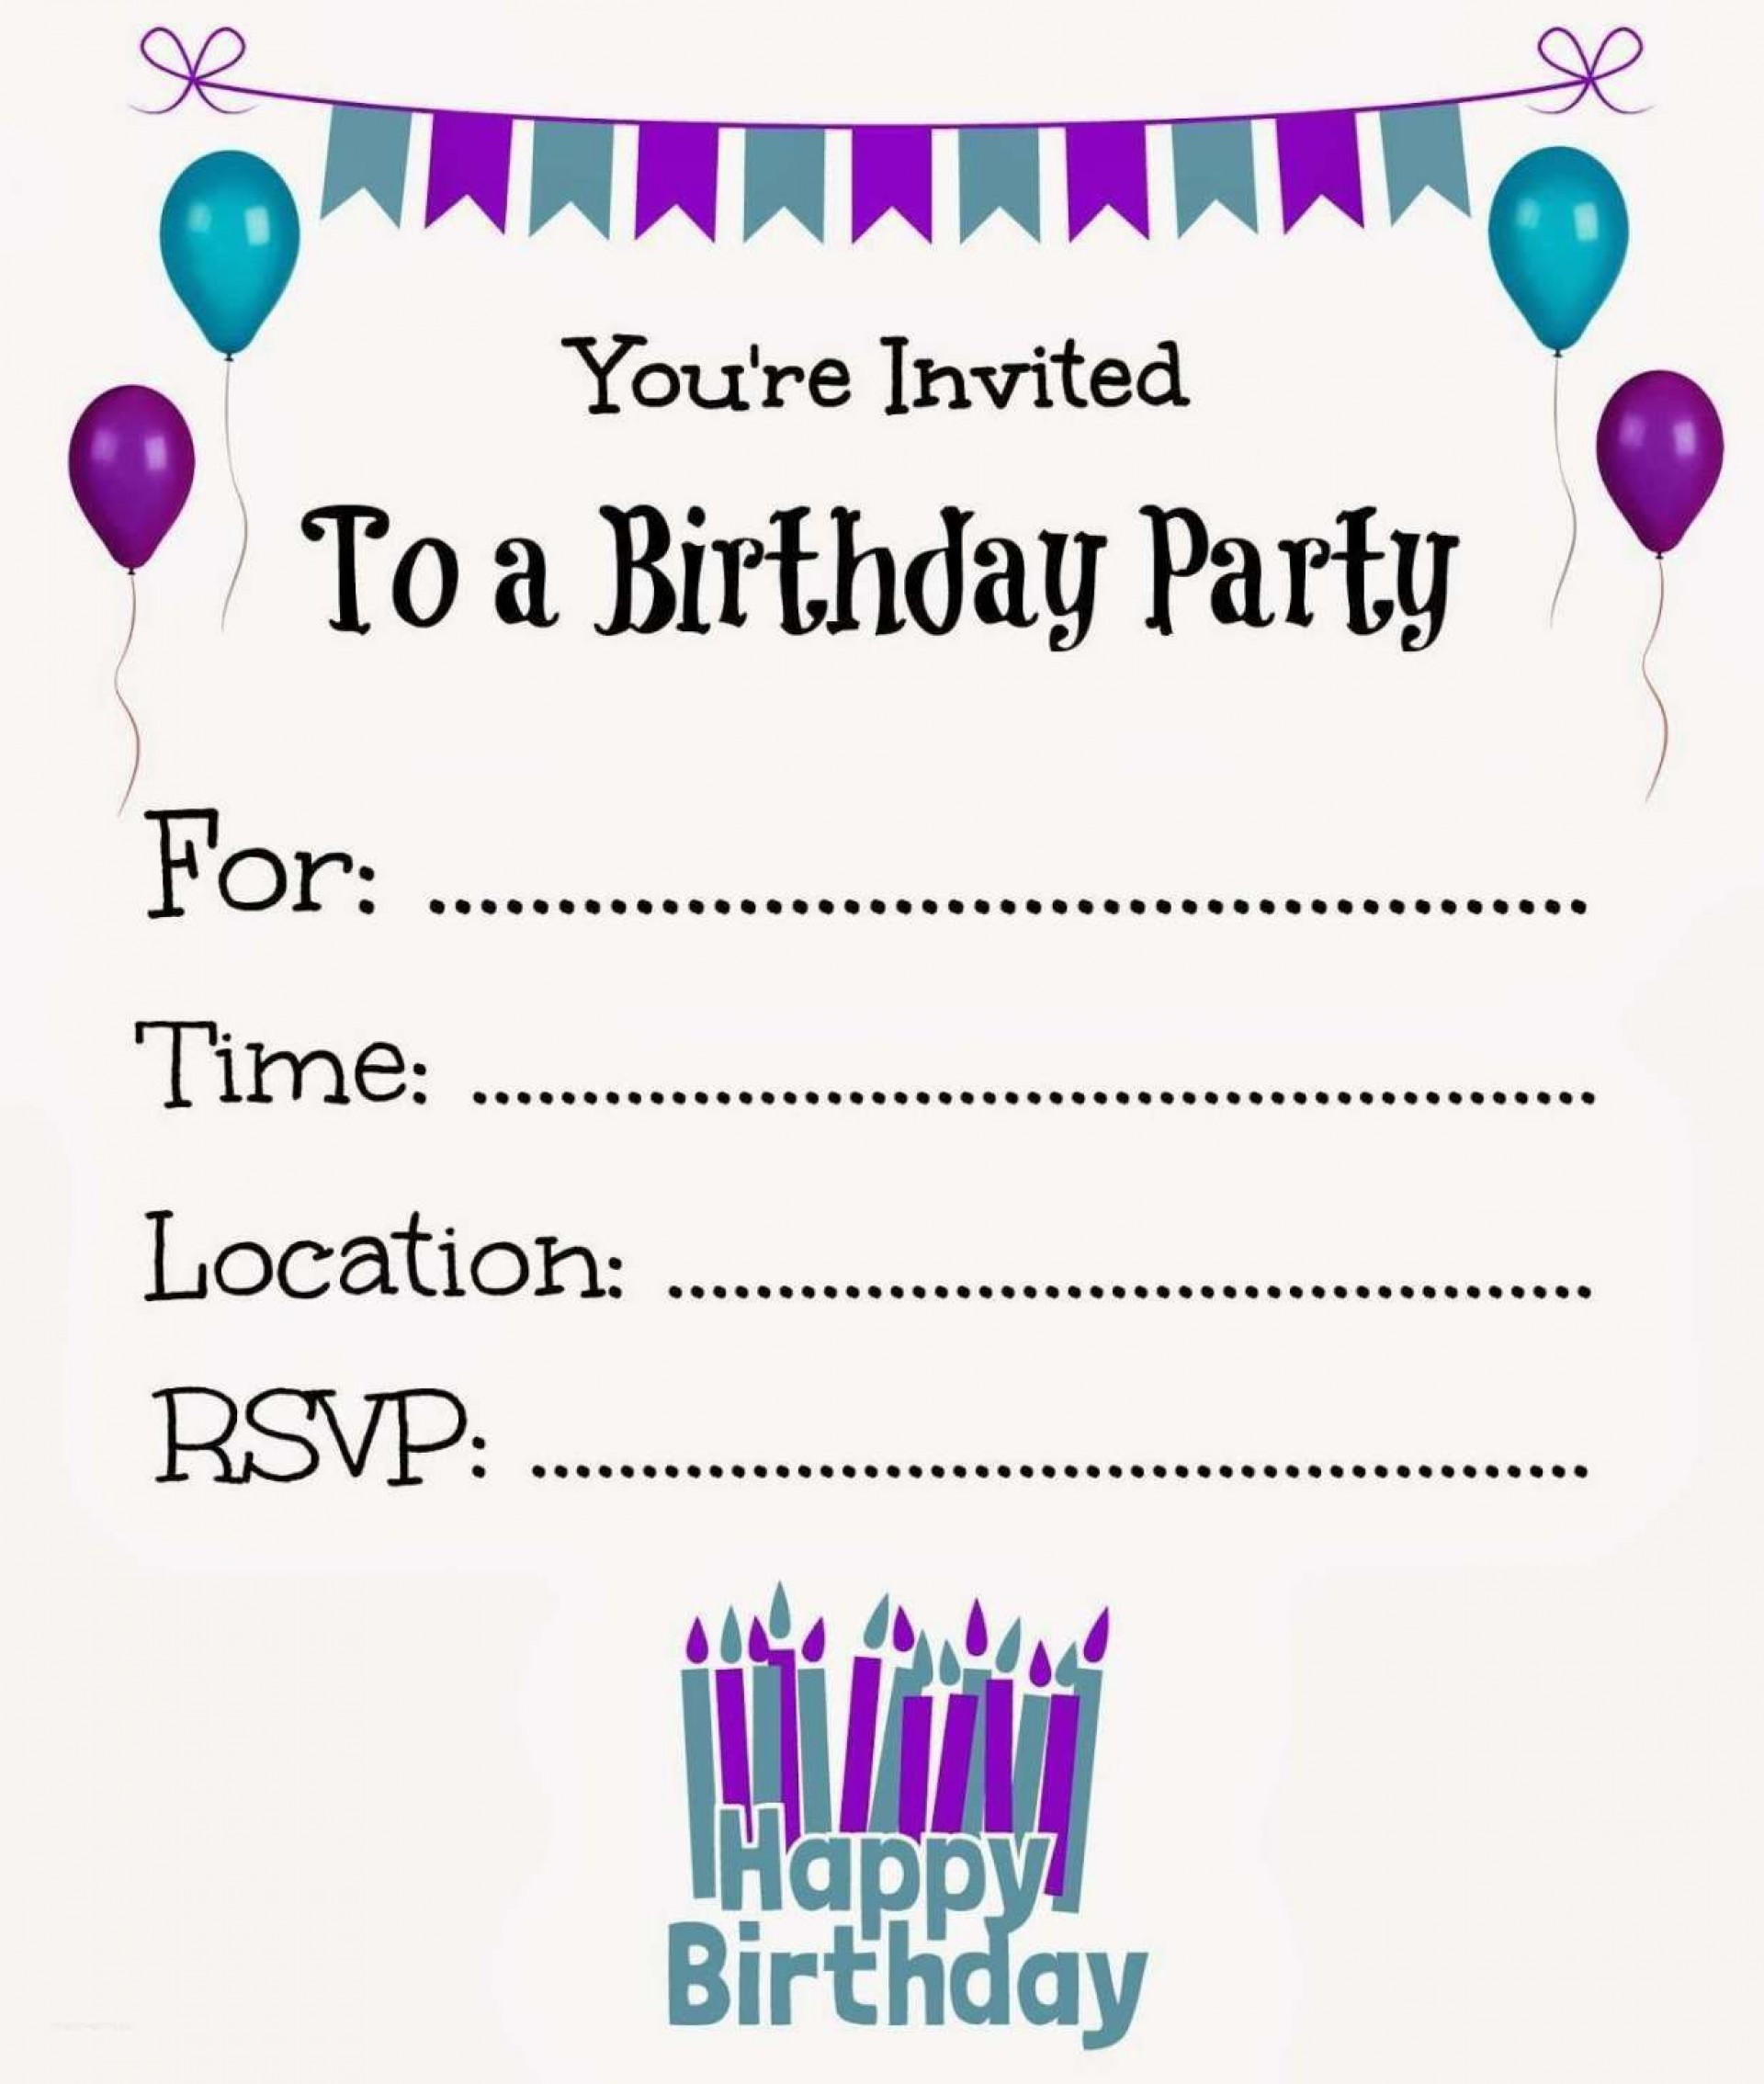 005 Amazing Free Online Printable Birthday Invitation Template Inspiration  Templates Card Maker1920